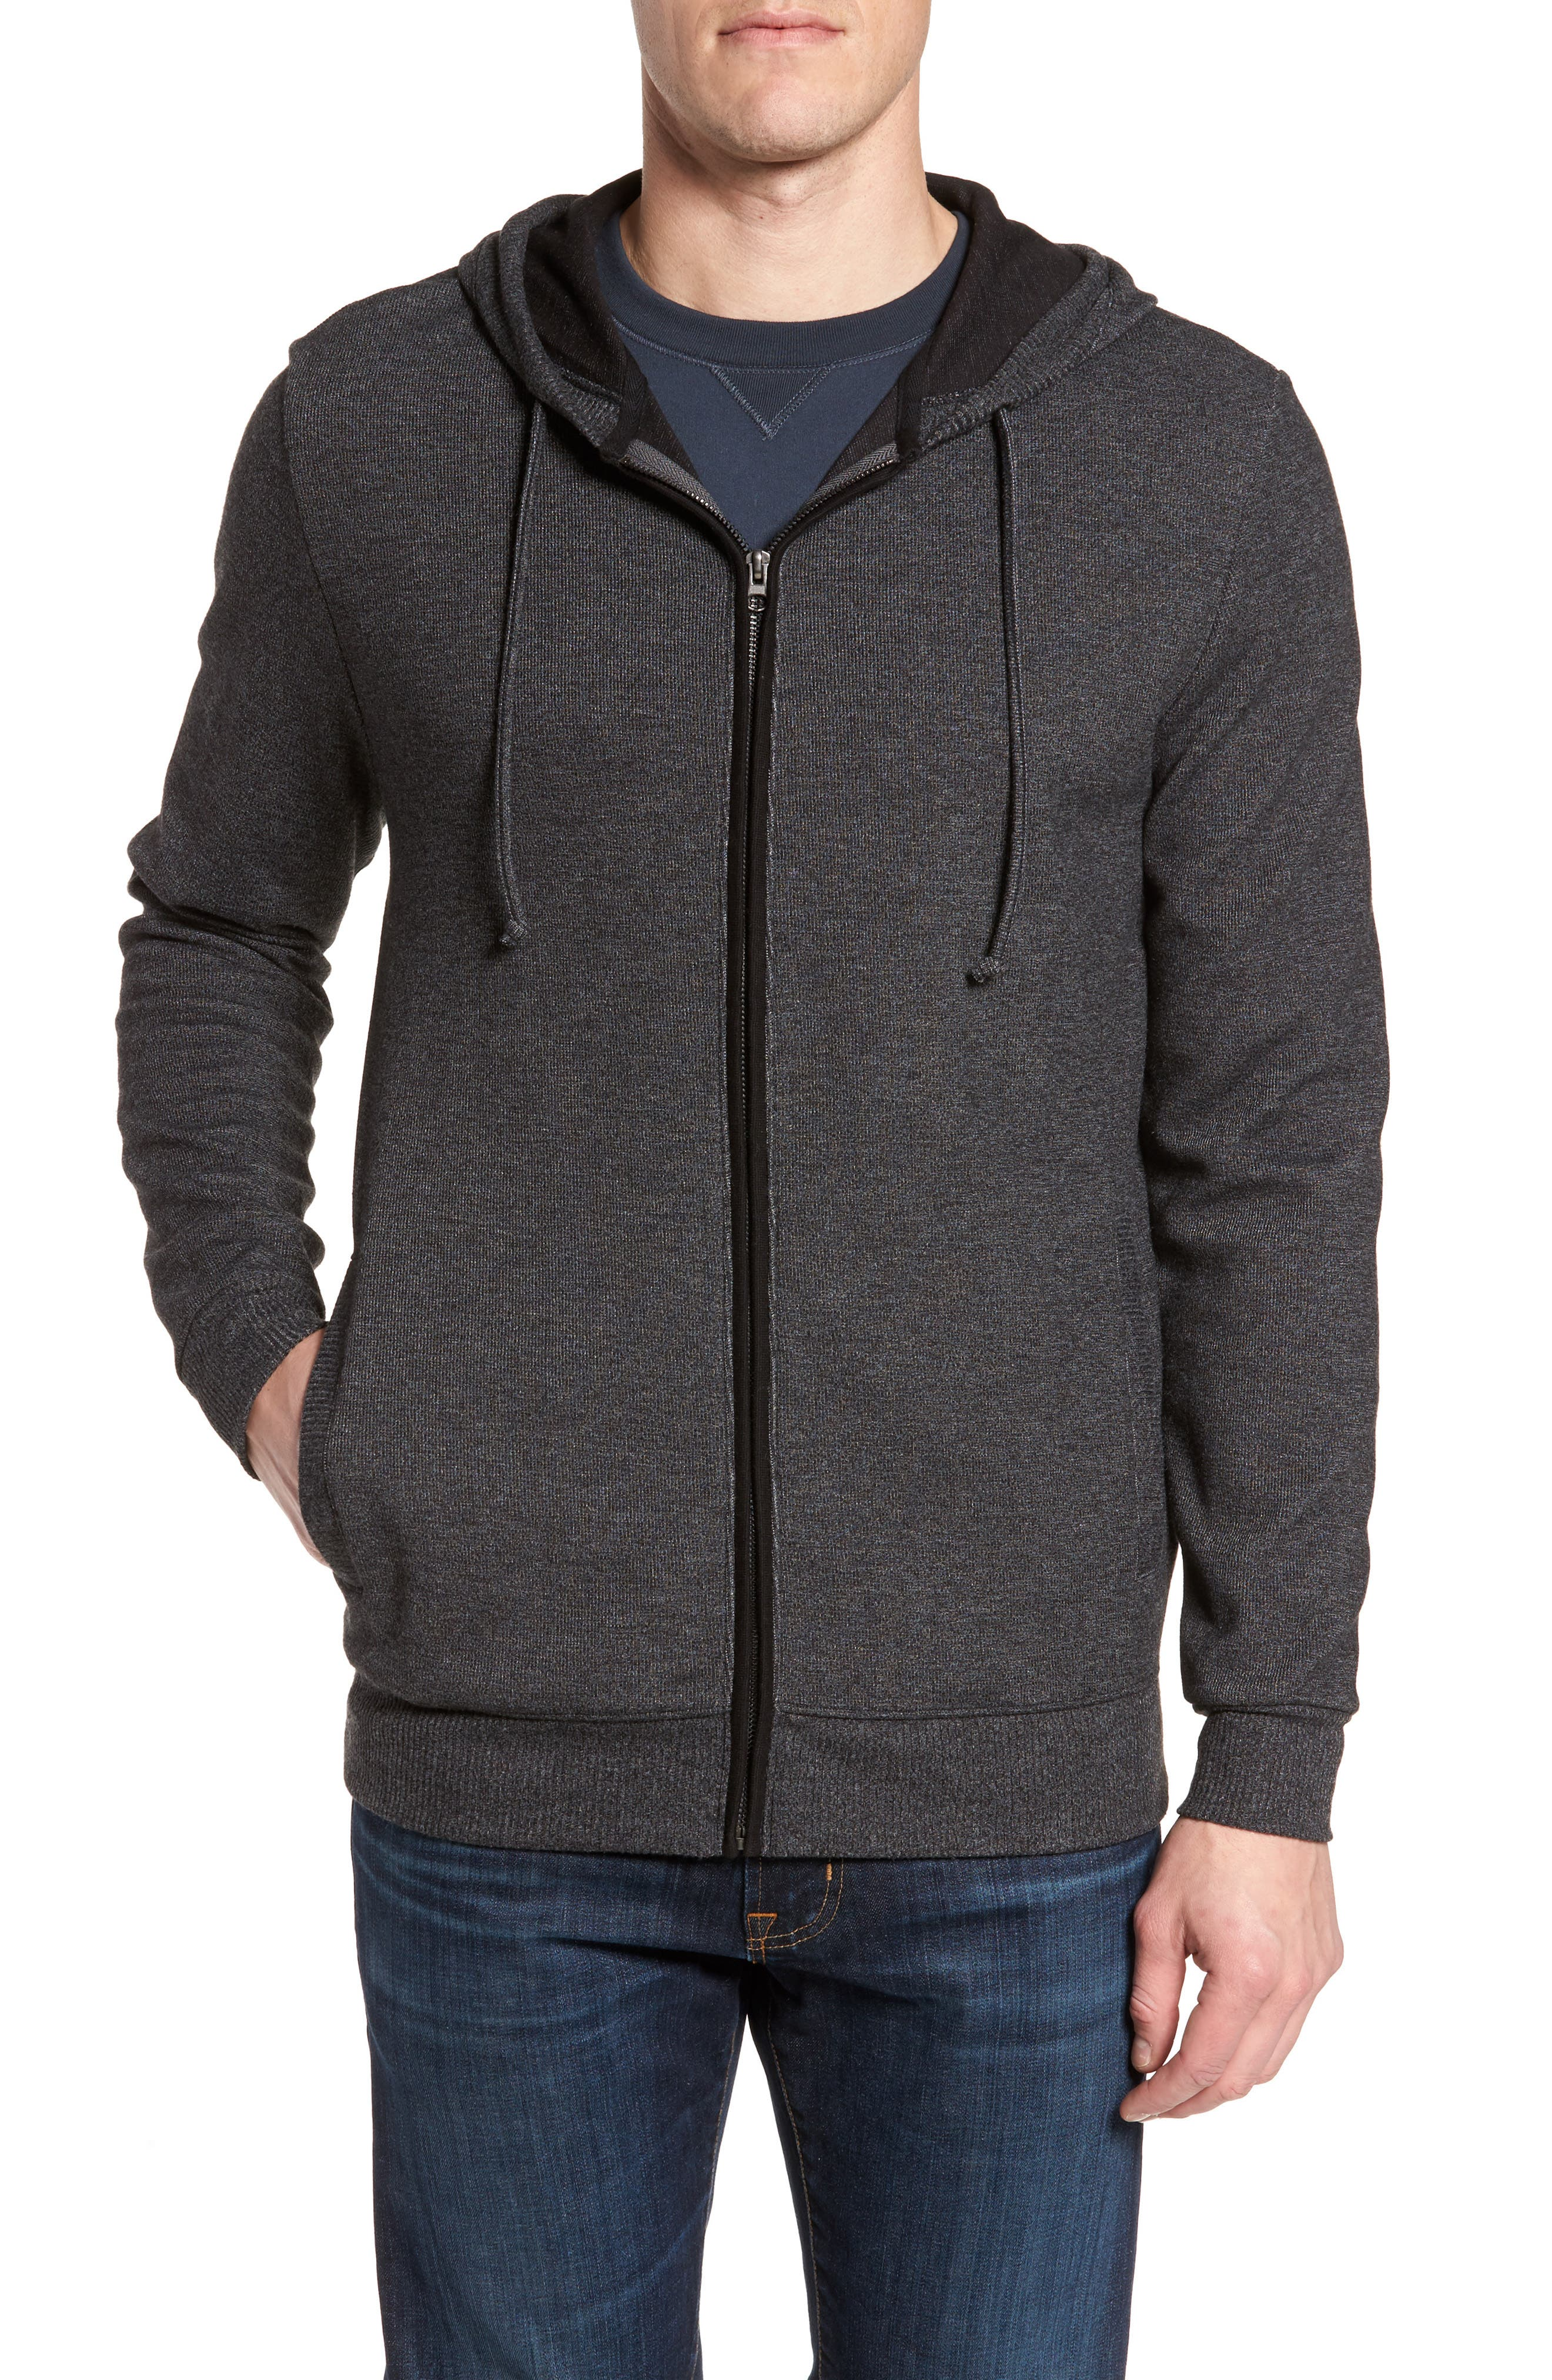 Alternate Image 1 Selected - Travis Mathew Snare Zip Front Hooded Cardigan